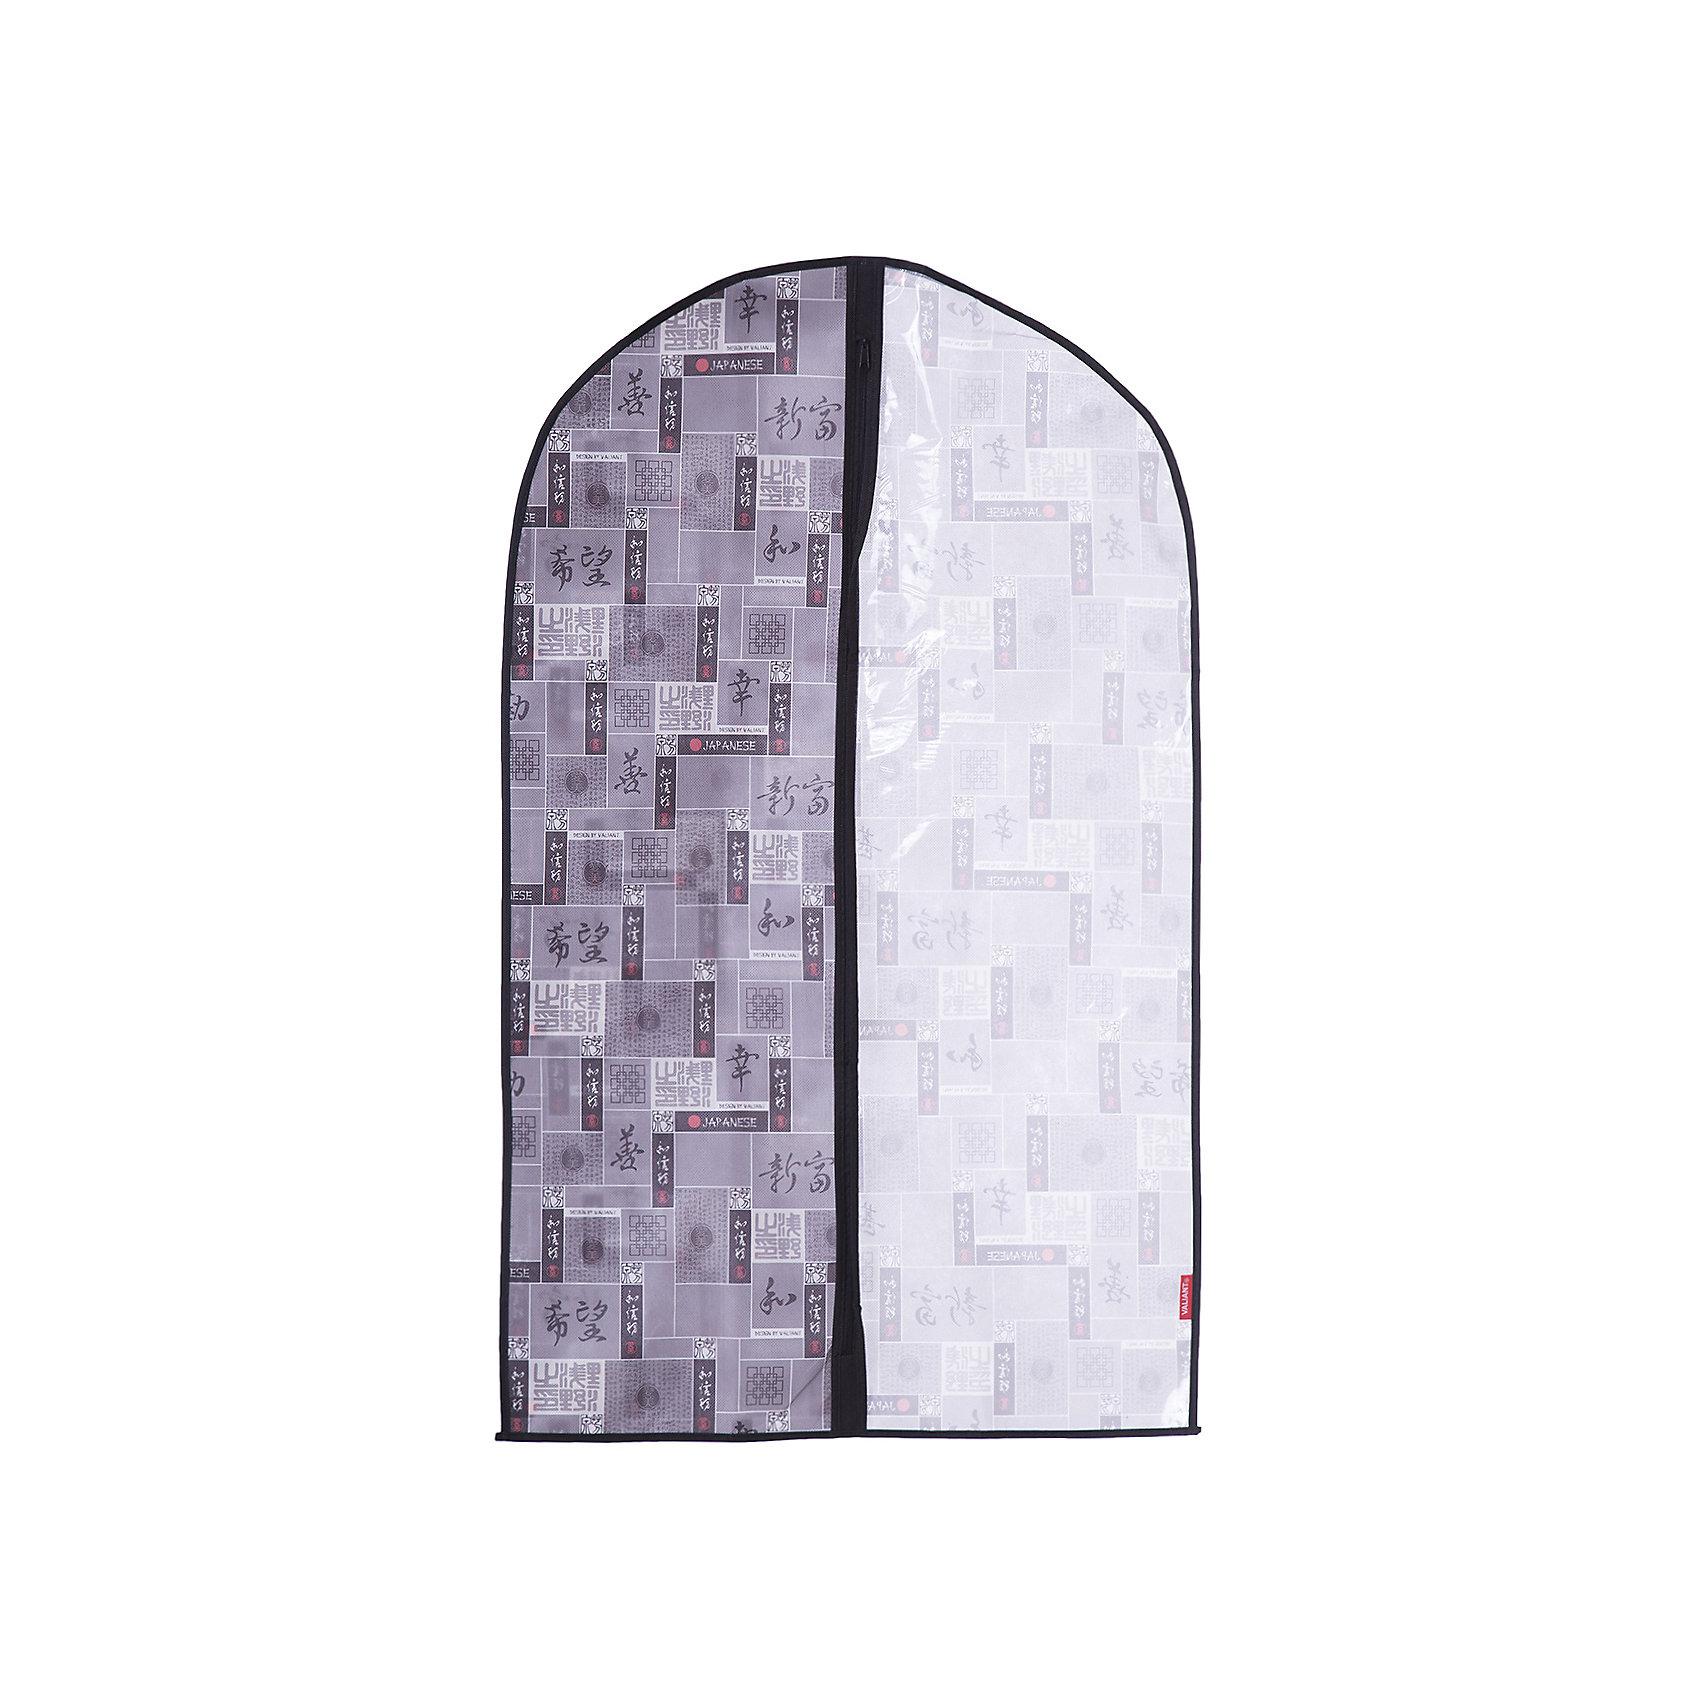 VALIANT Чехол для одежды, малый, 60*100*10 см, JAPANESE BLACK, Valiant